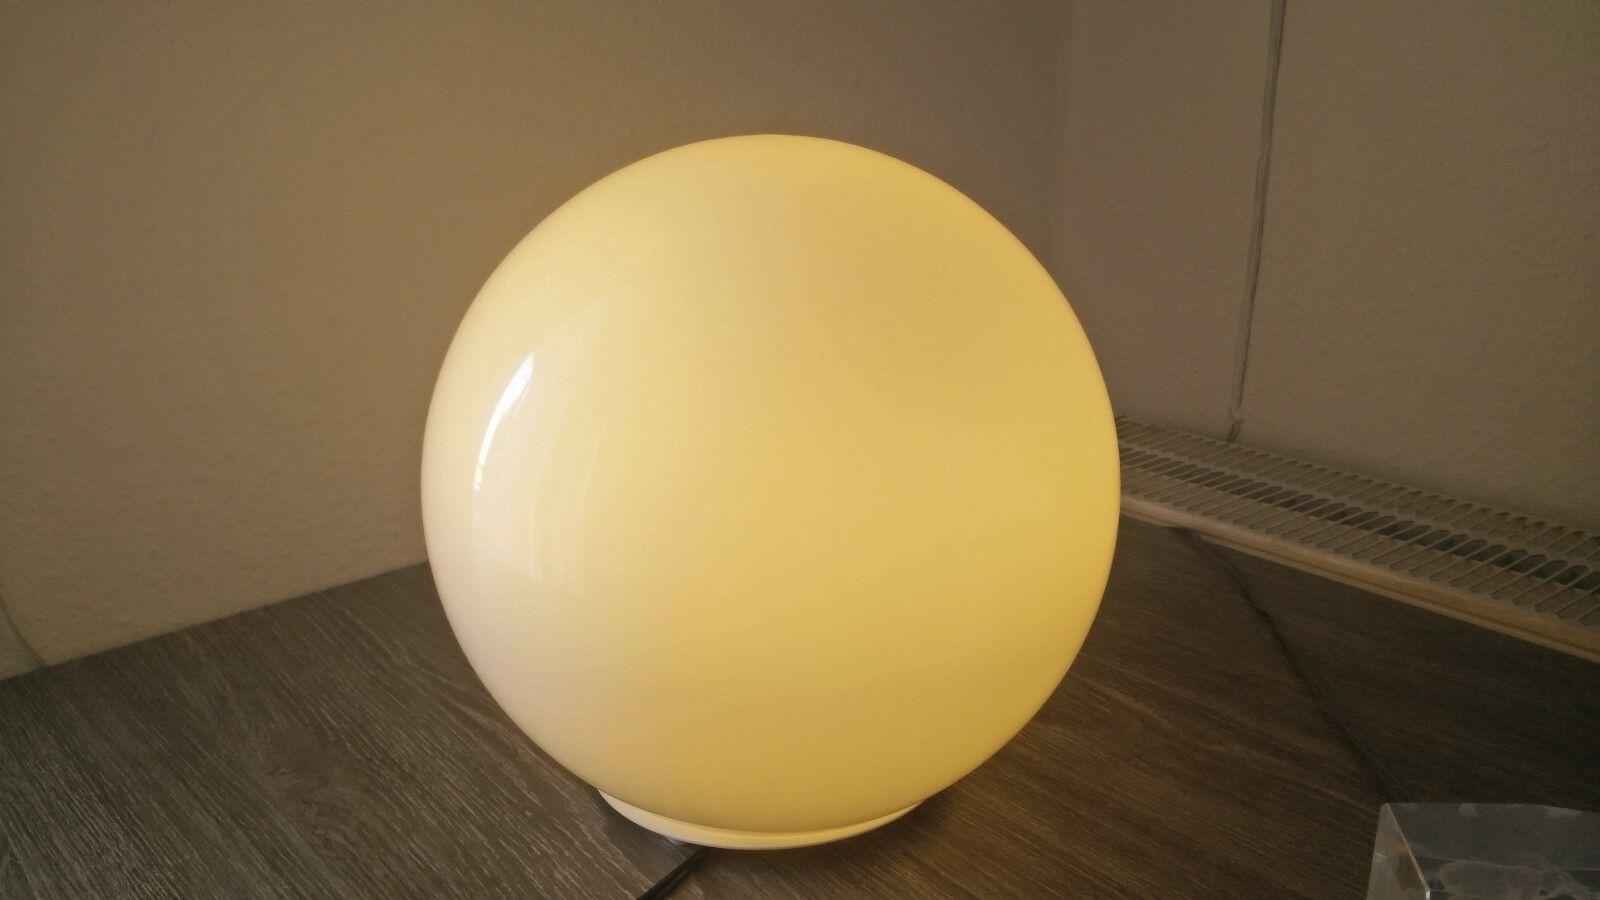 MD smartlight Smart-Home WLAN intelligente Lampe viele Funktionen, Geräusche neu